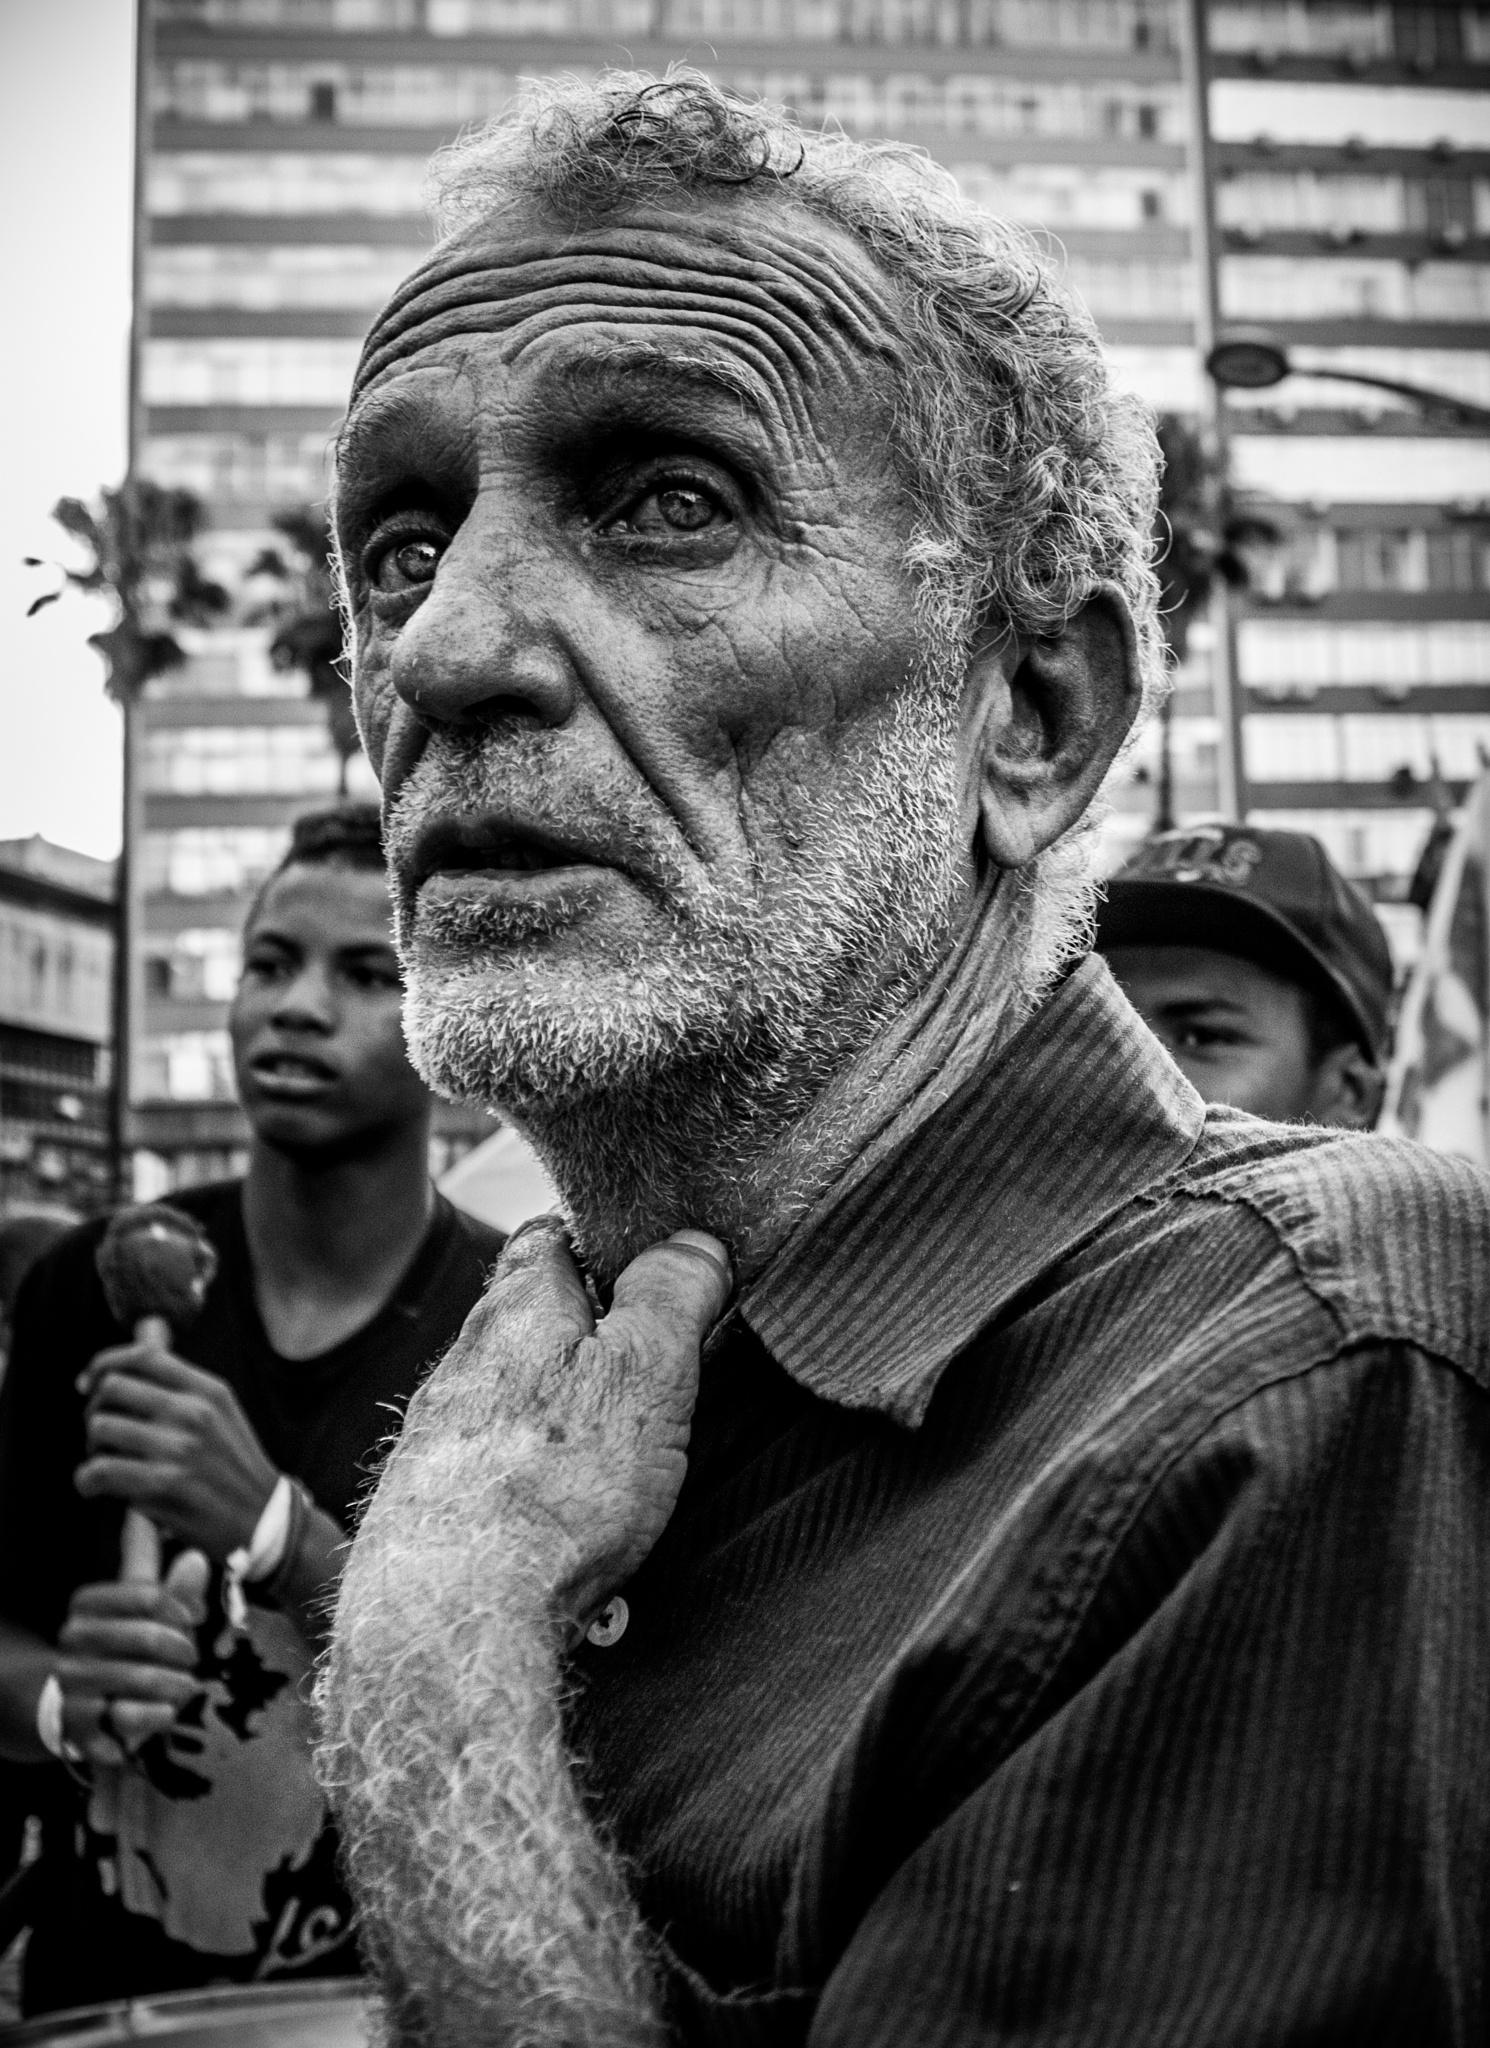 The oldman by Pedro Antonio Heinrich